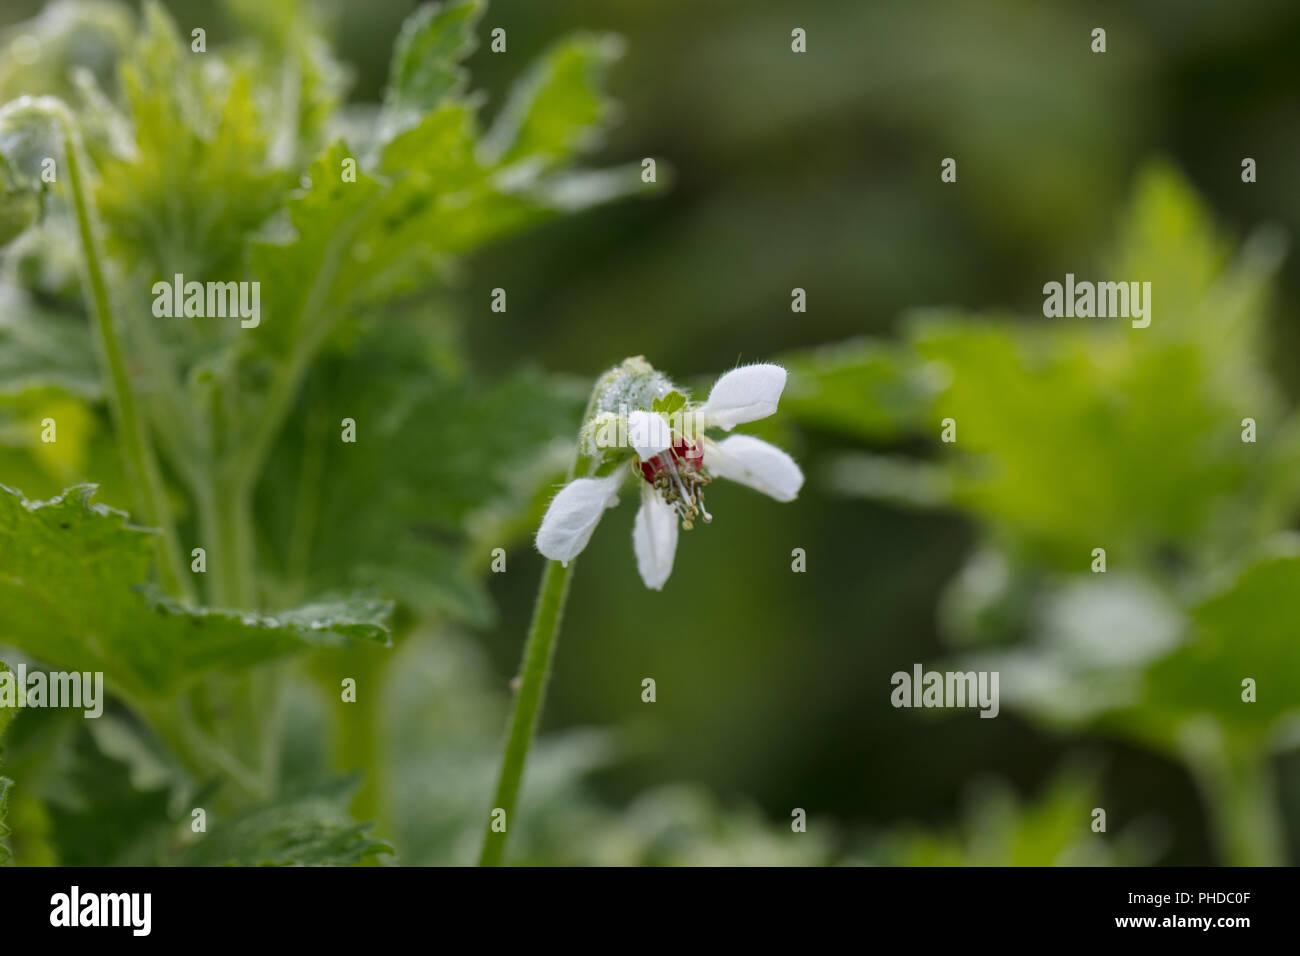 Sting lily, Saloa hieronymi (Blumenbachia hieronymi) - Stock Image